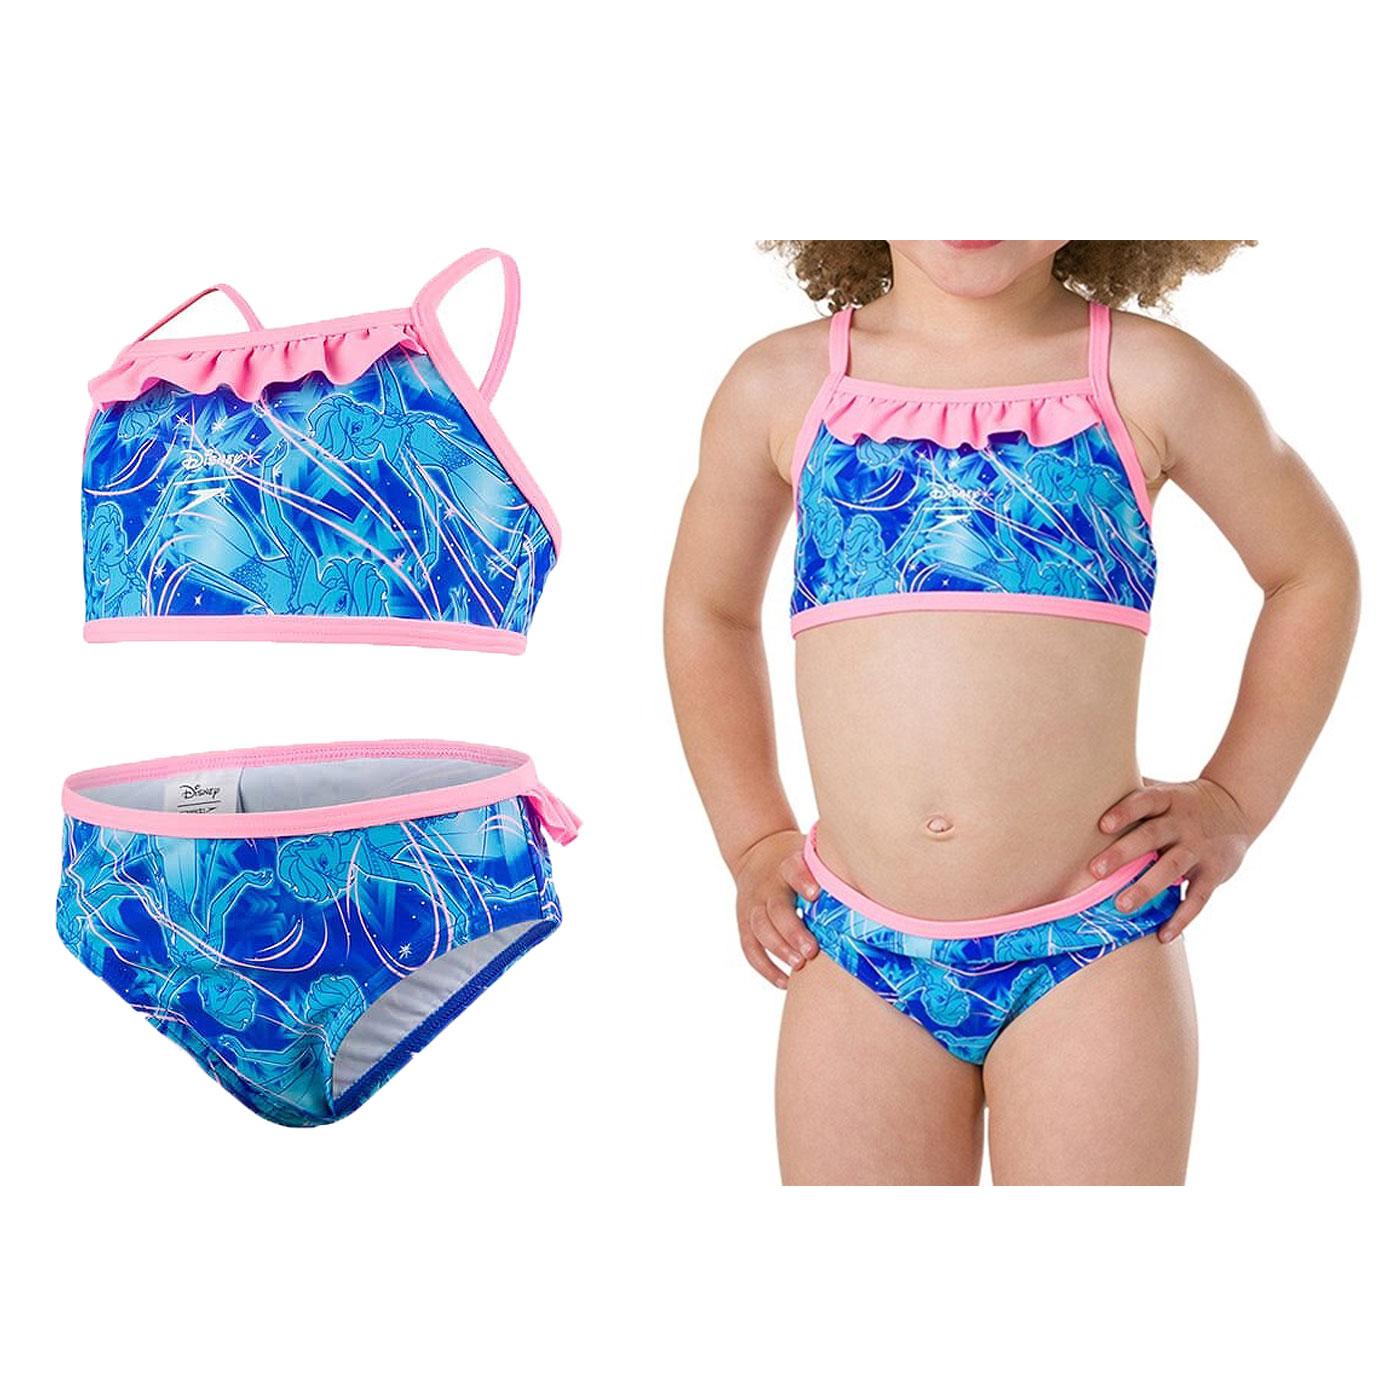 SPEEDO 女童休閒兩截式泳裝-冰雪奇緣 SD807971C783 - 粉紅藍